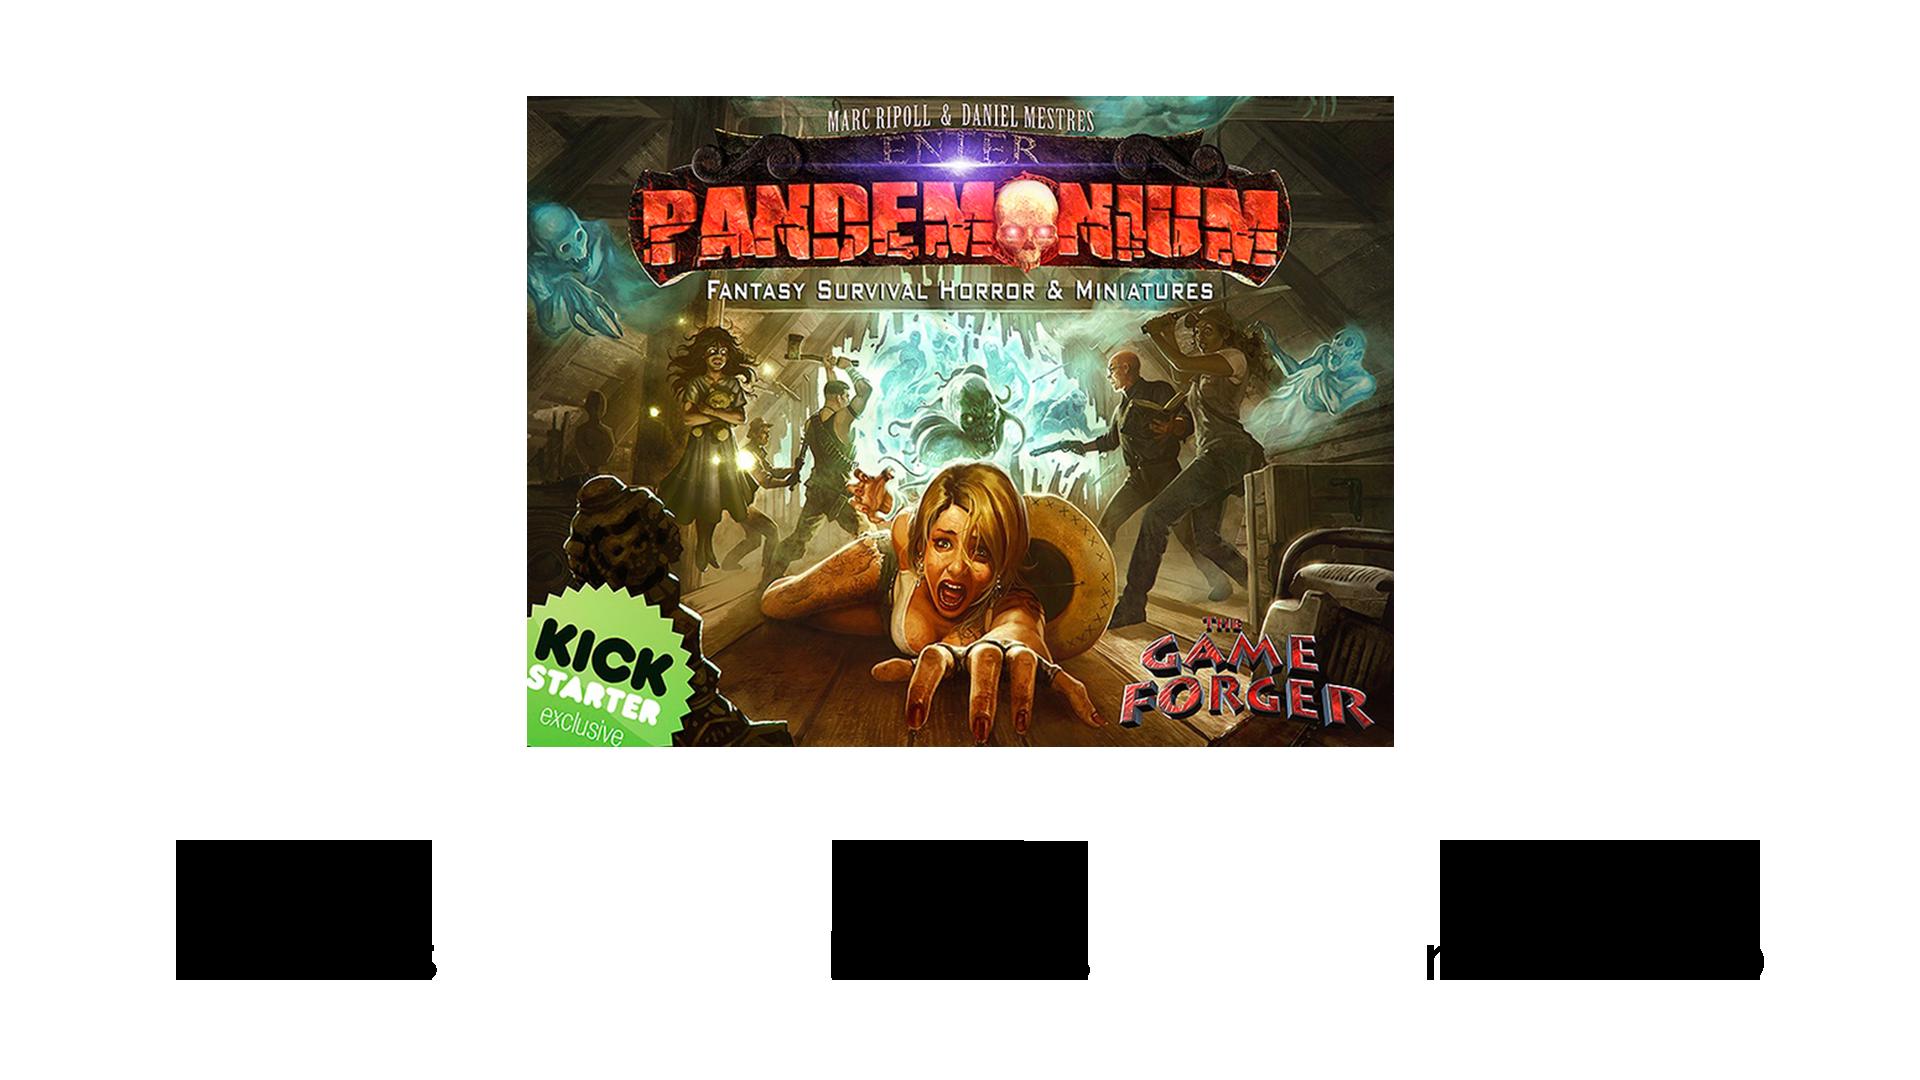 pandemonium proyecto kickstarter españa SYBIC crowdfunding